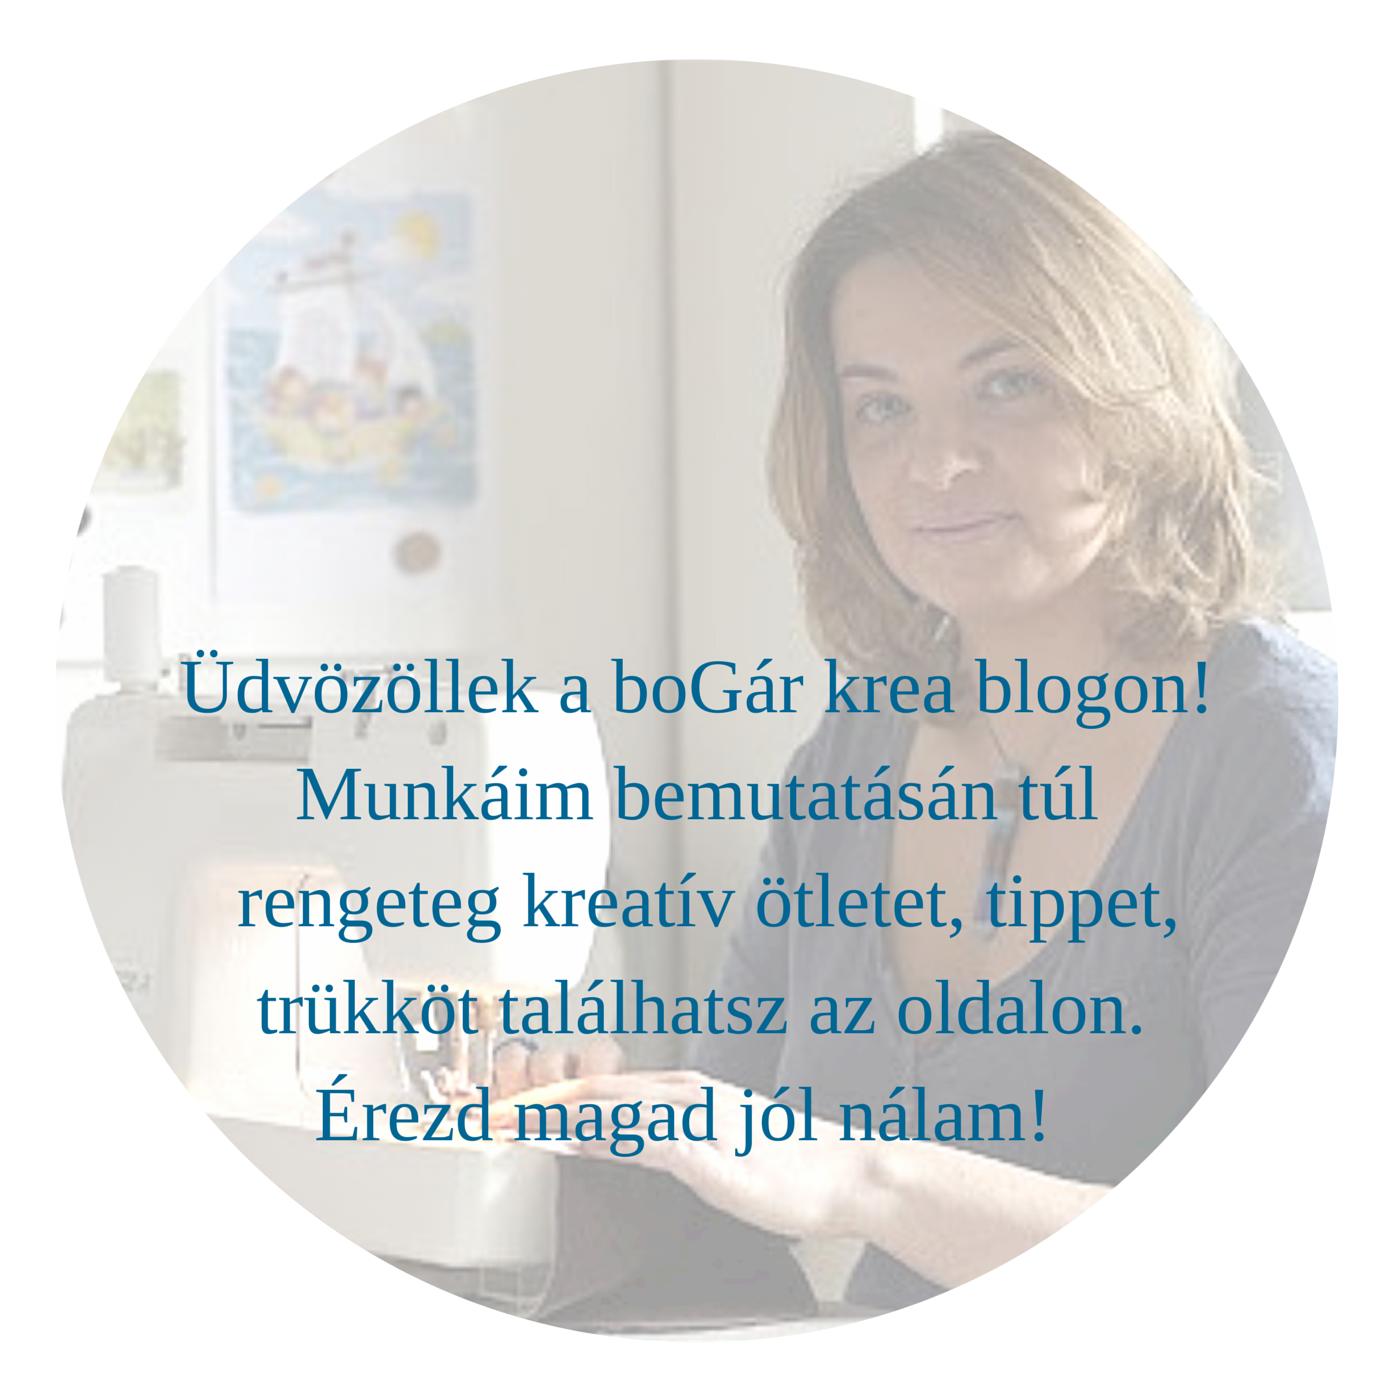 http://bogarkrea.blogspot.hu/p/bemutatkozas.html